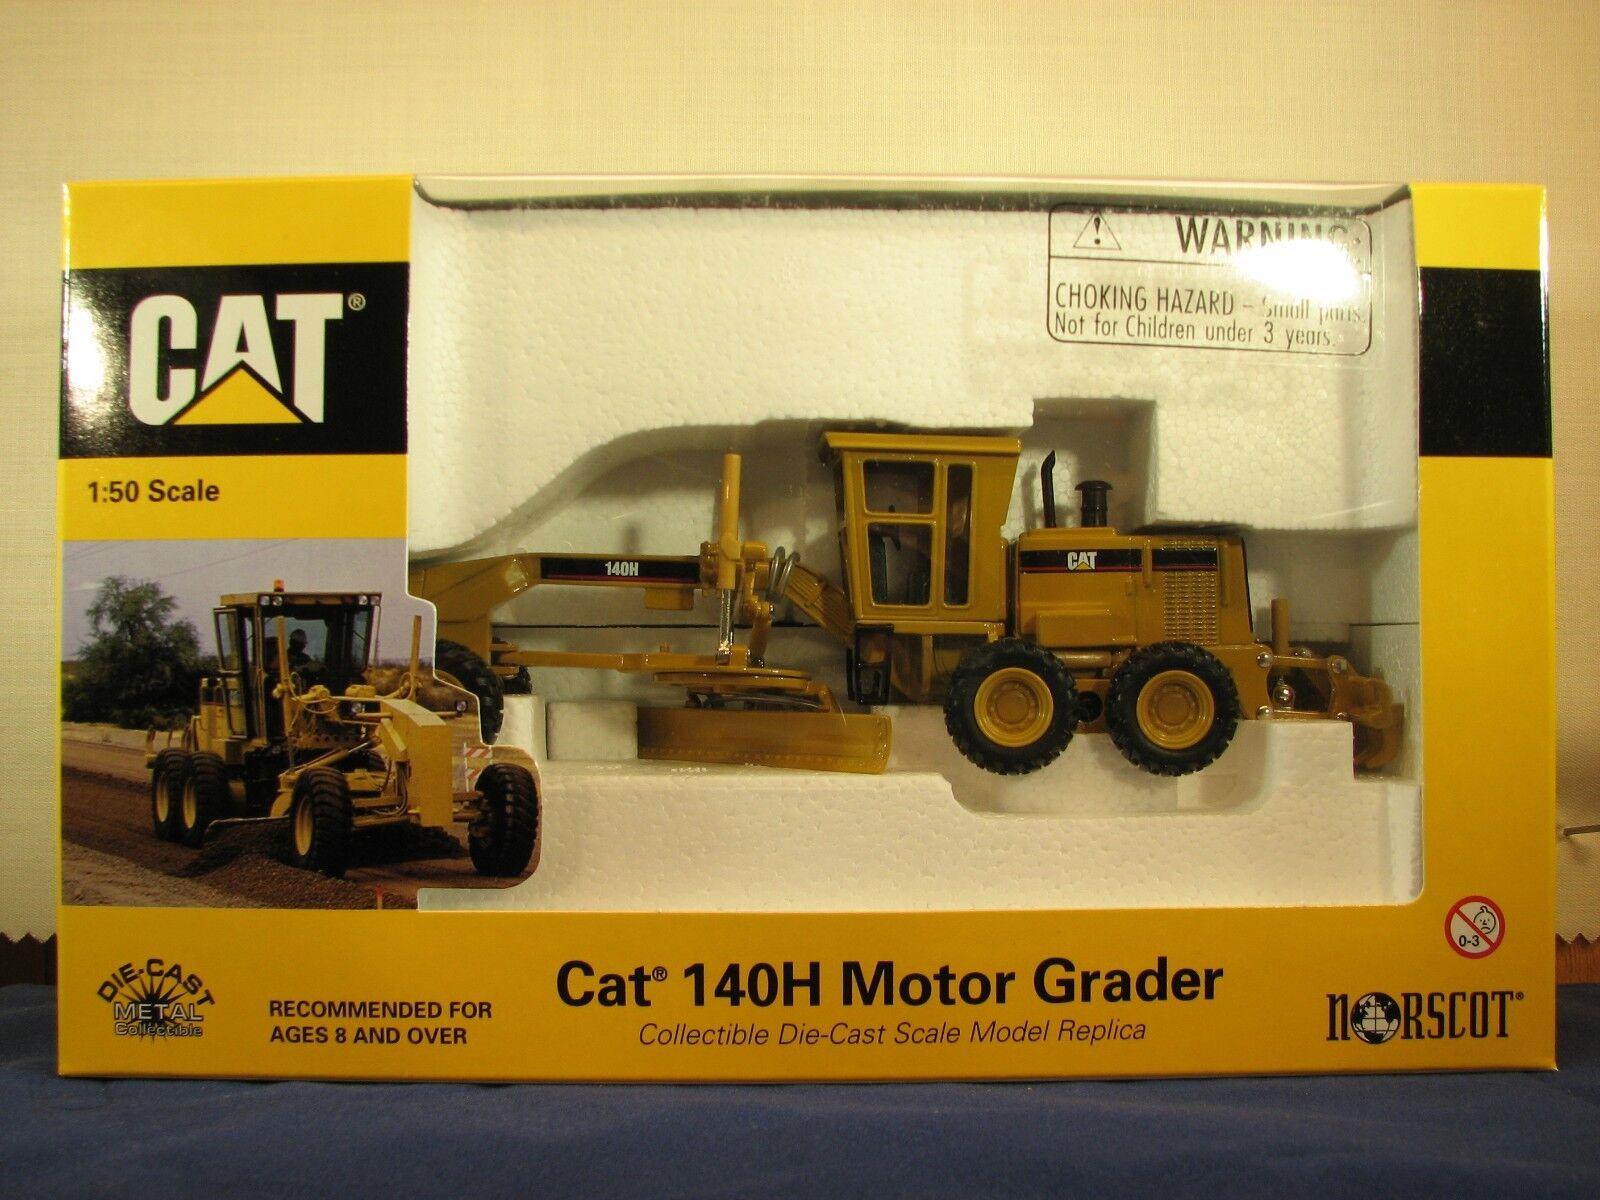 Norscot 55030 caterpillar 140H motor grader 1 50 scale diecast new